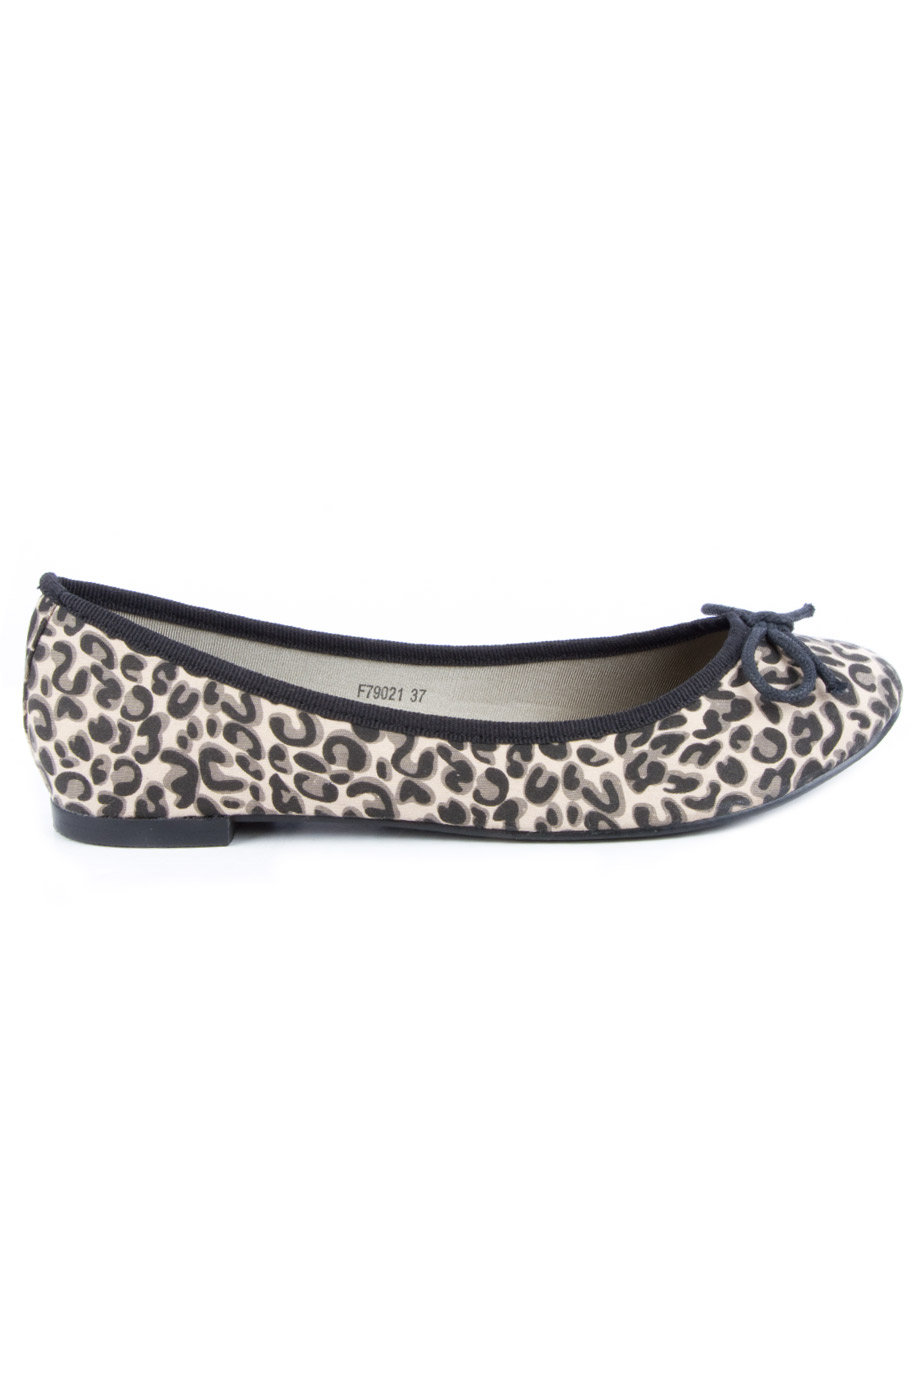 EAT - bailarinas leopardo de mimao |   isasaweis | moda online television